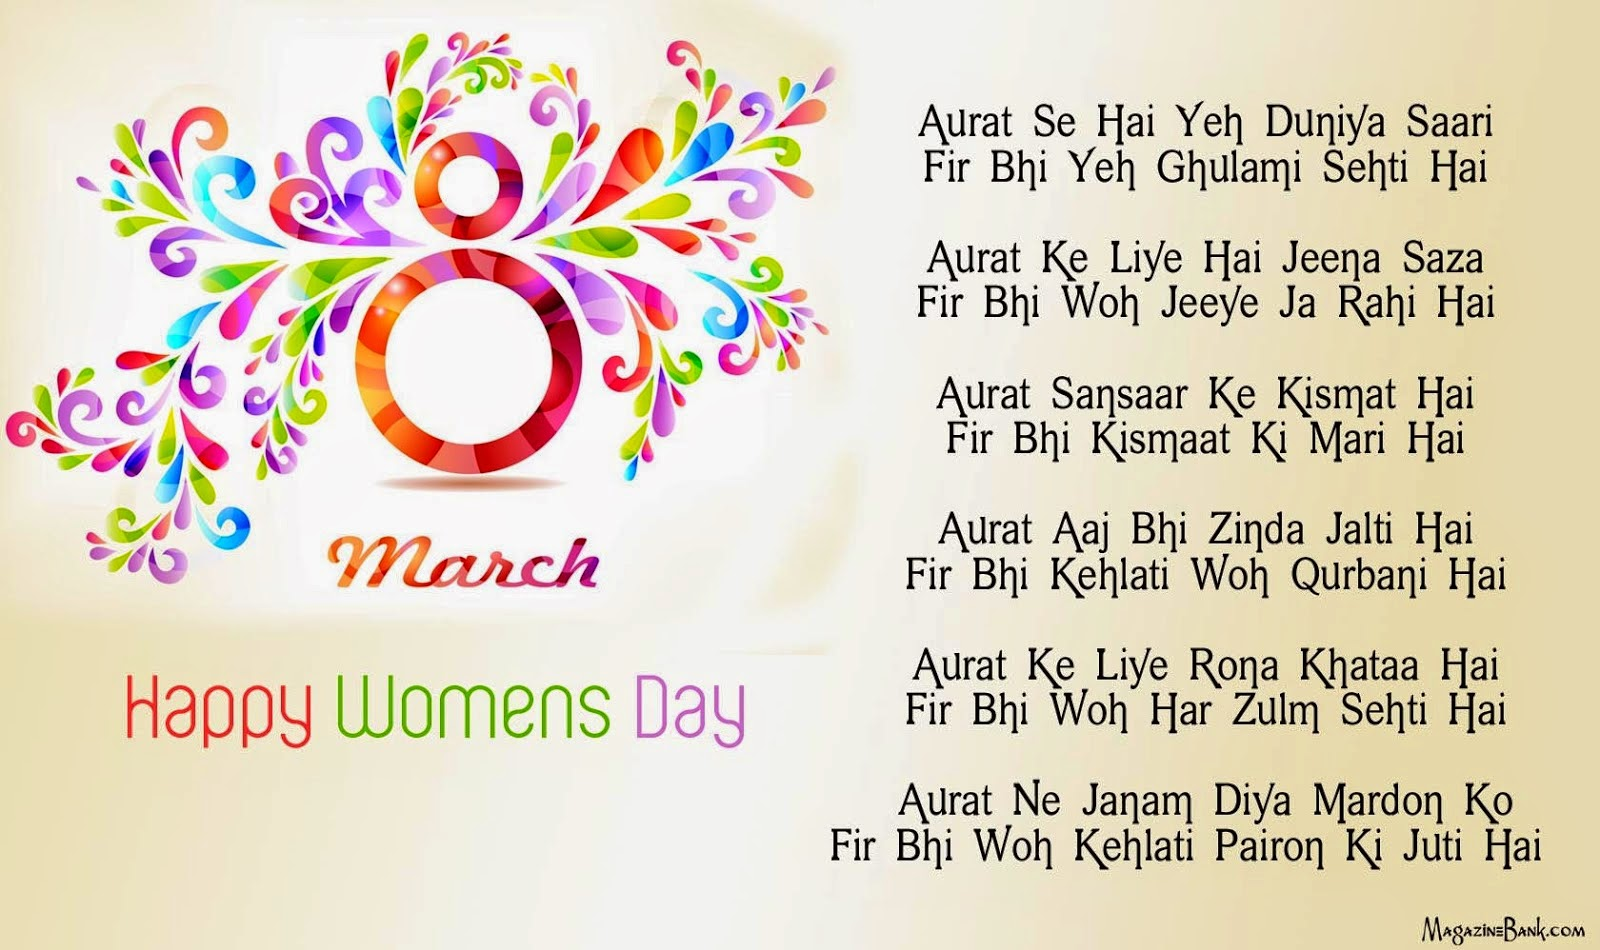 8th March Shayari for Women's Day